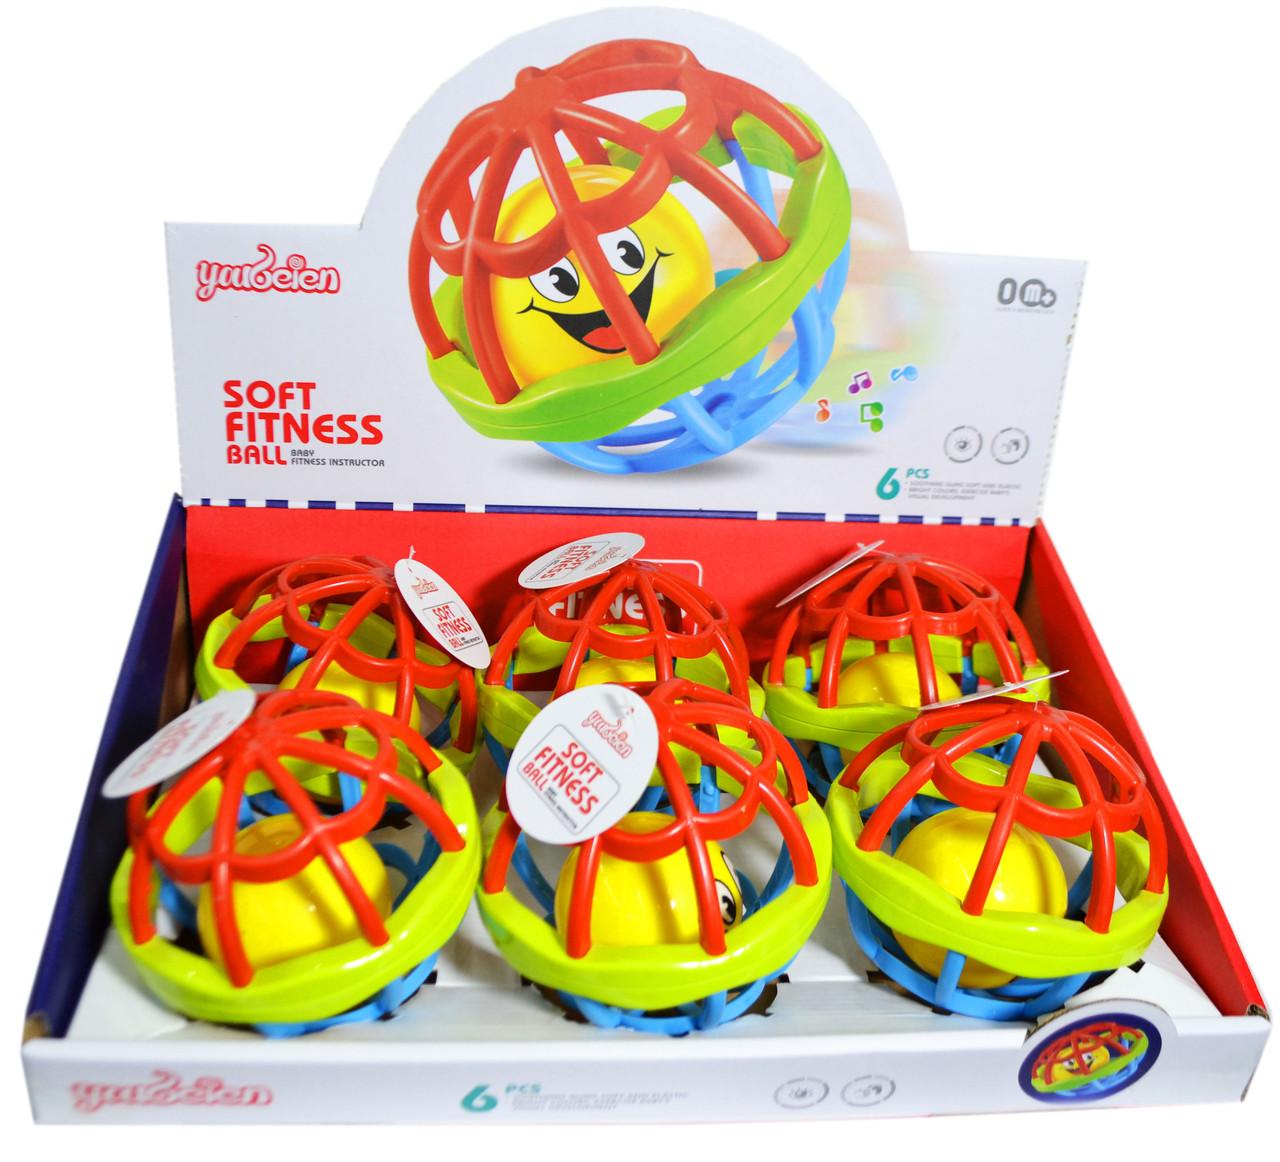 RT779 Погремушка Youbeien Soft Fitness ball 6  шт, цена за 1шт 11 см